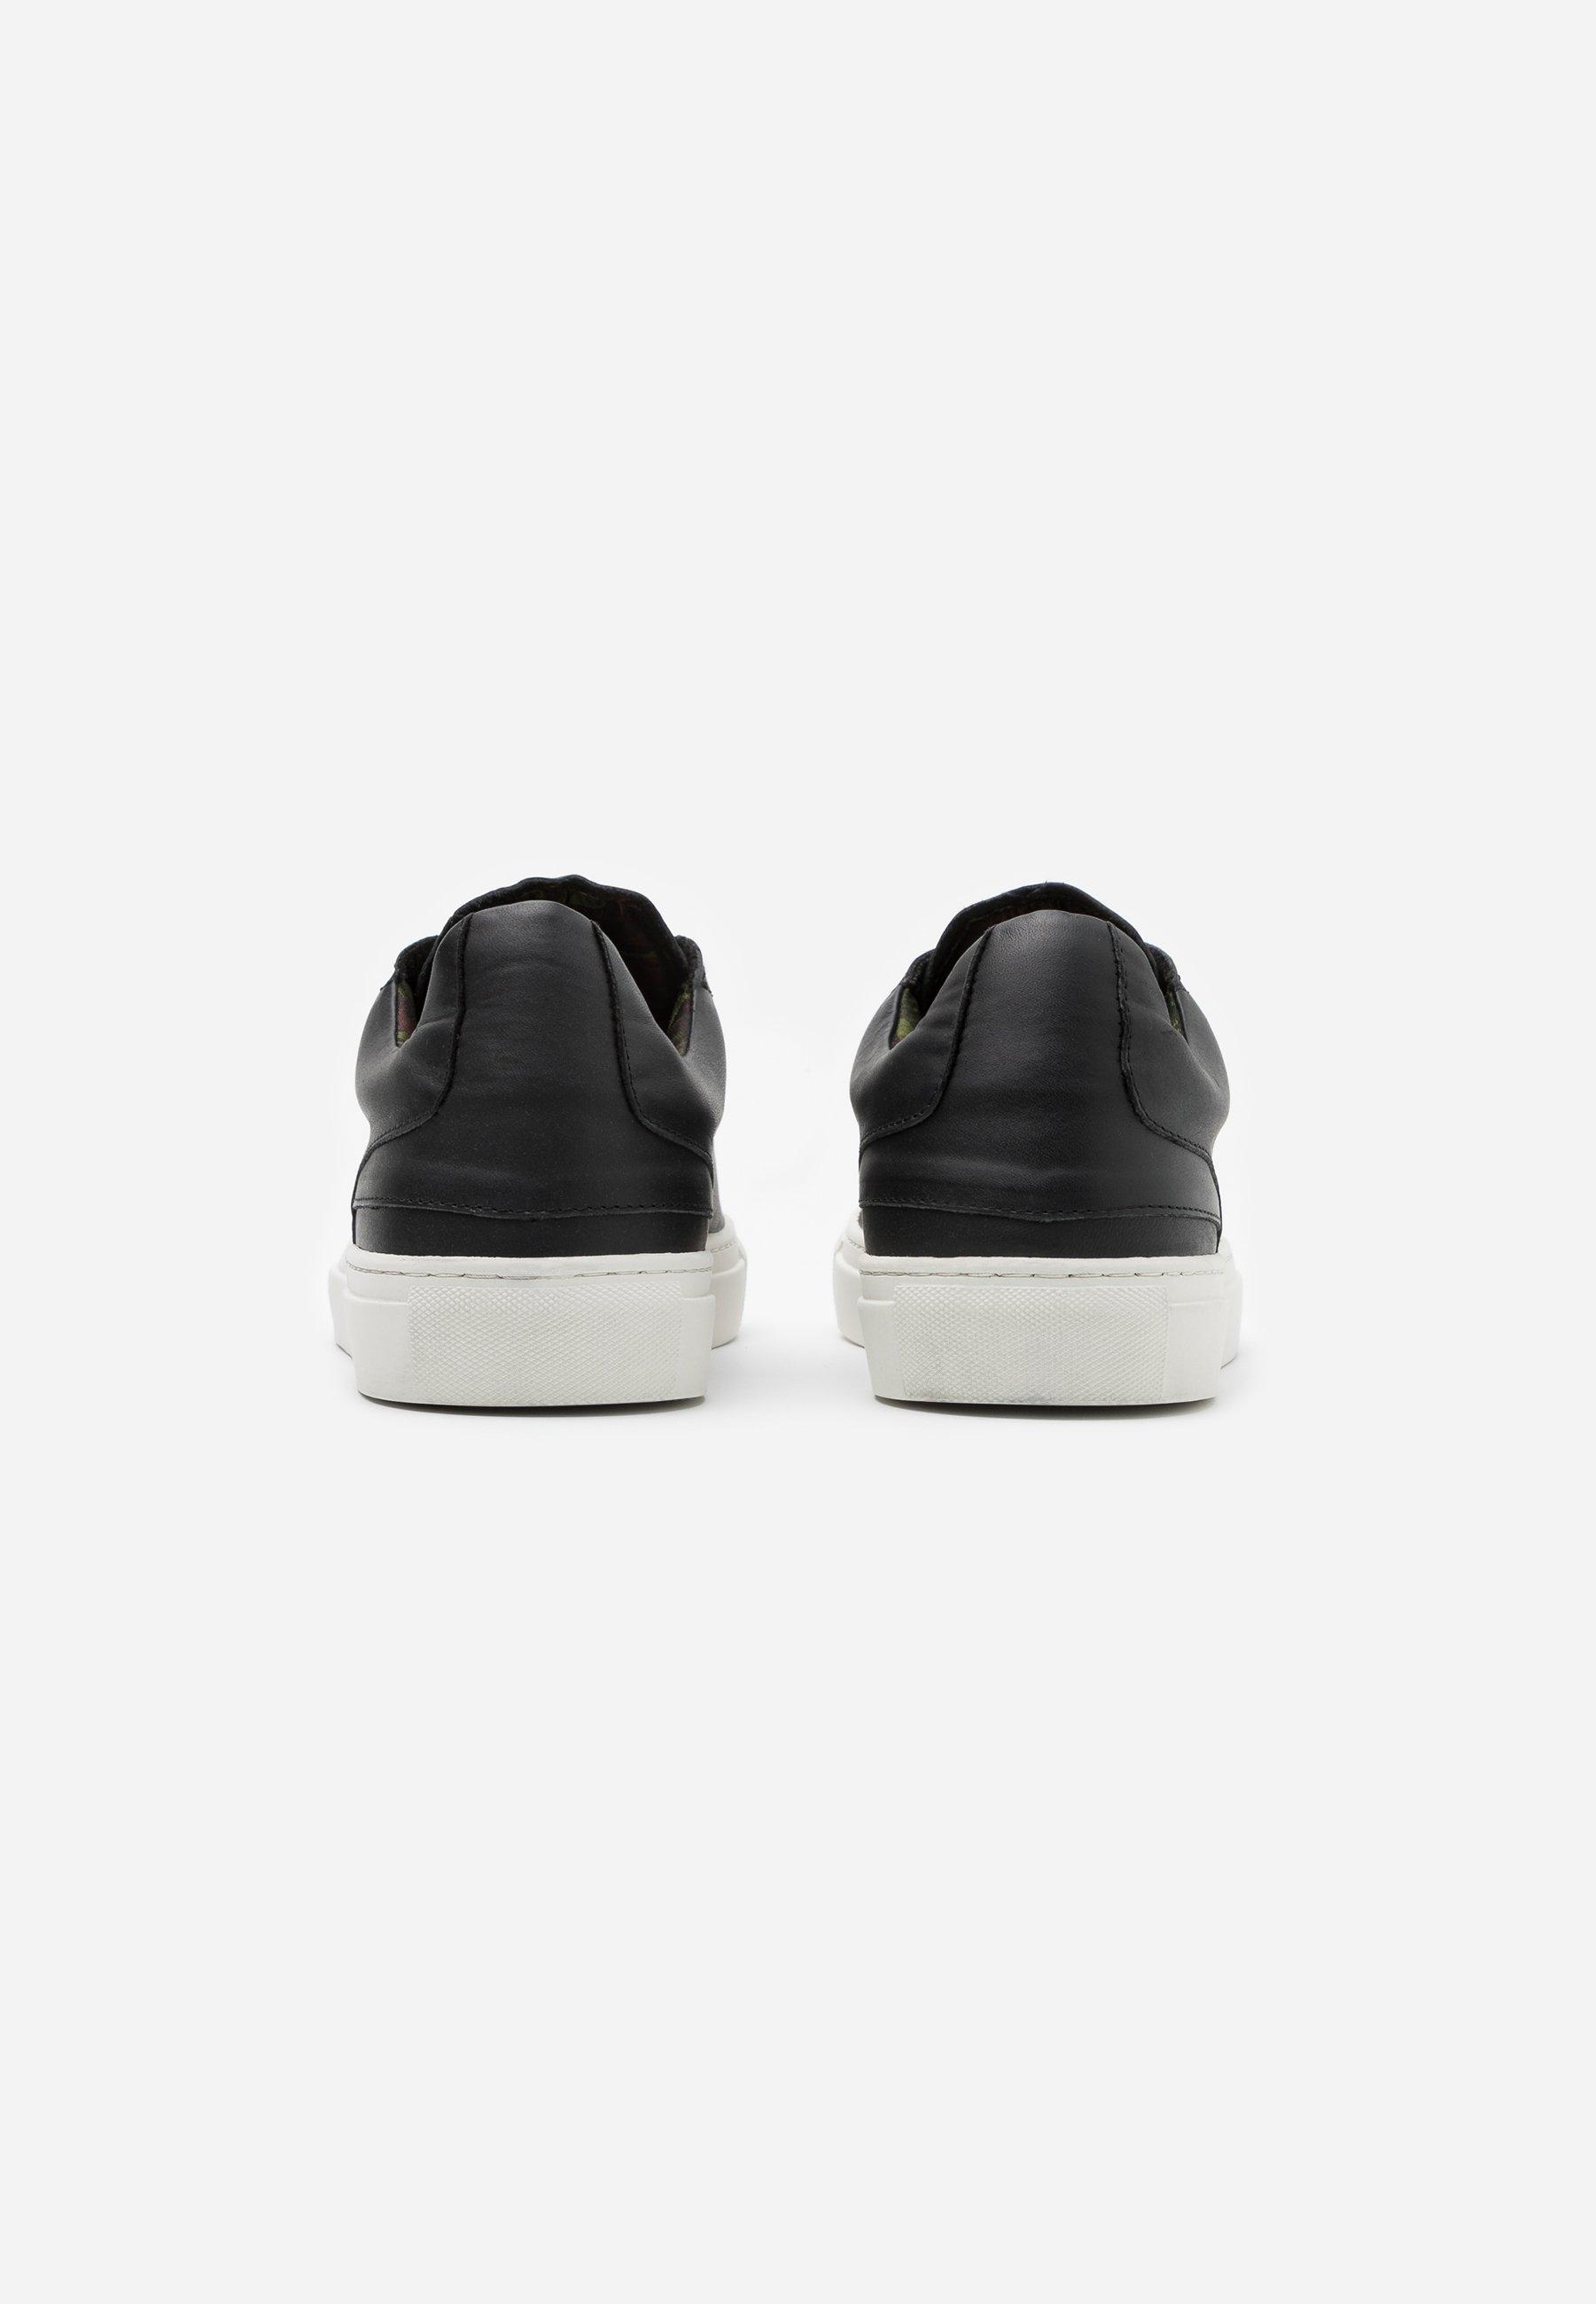 GRADUATE Sneakers nappa vegetal black